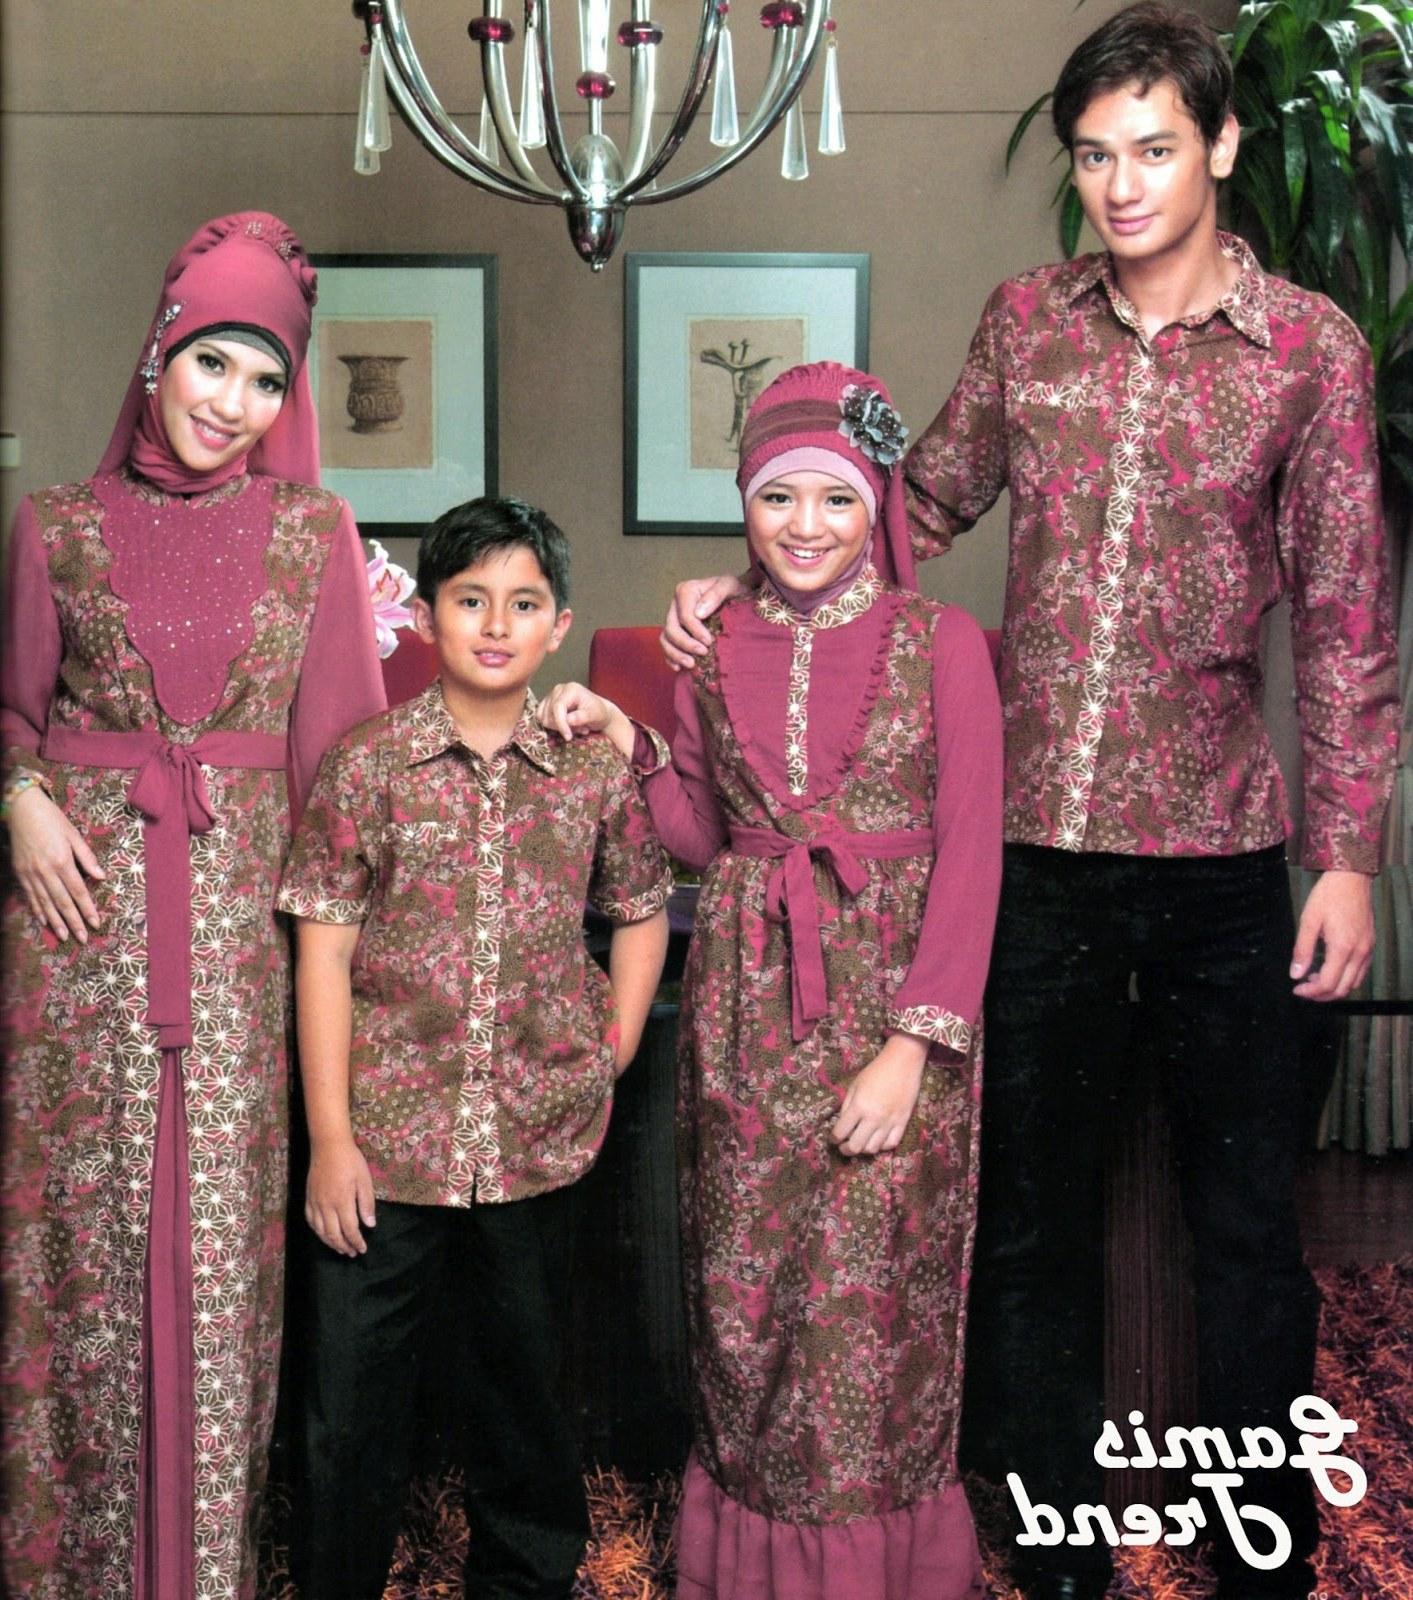 Ide Baju Lebaran Anak Muslim E6d5 Model Baju Batik Muslim Anak